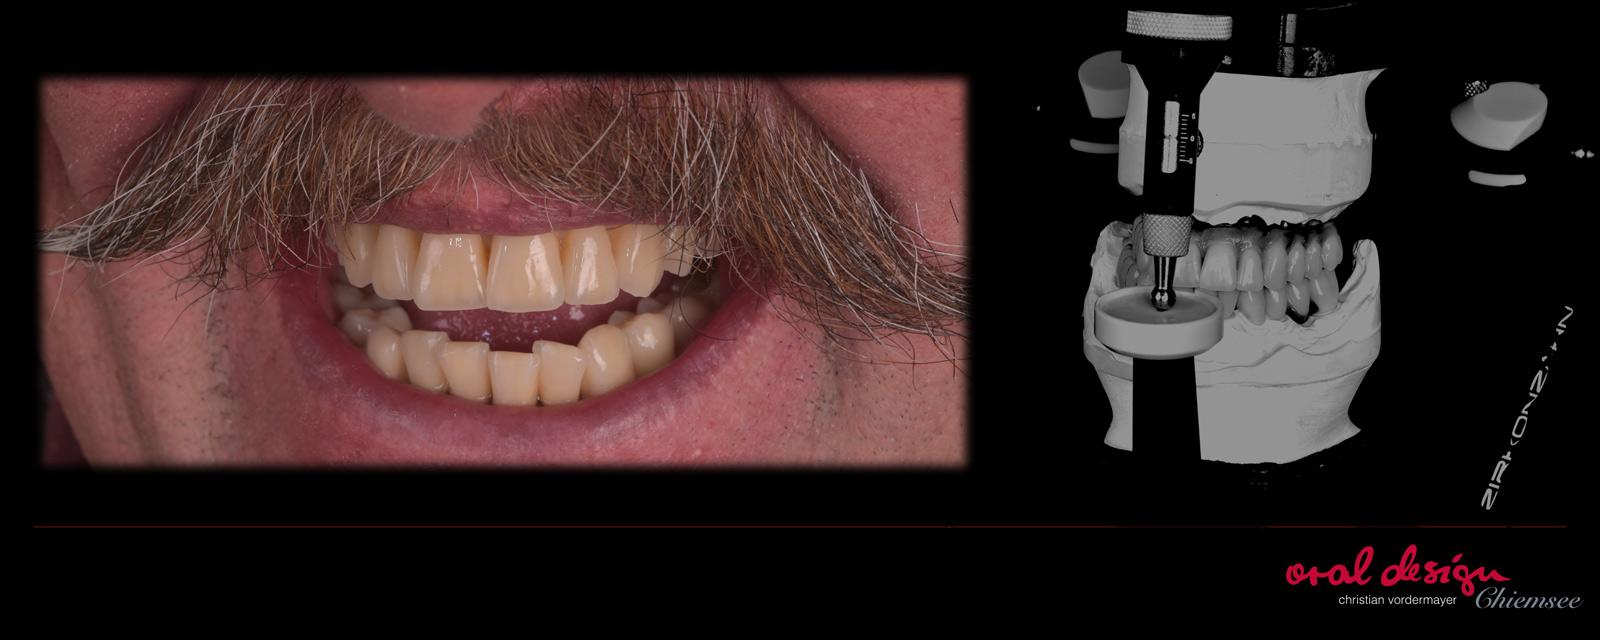 implantatprothetik-oraldesign-chiemsee-223.jpg